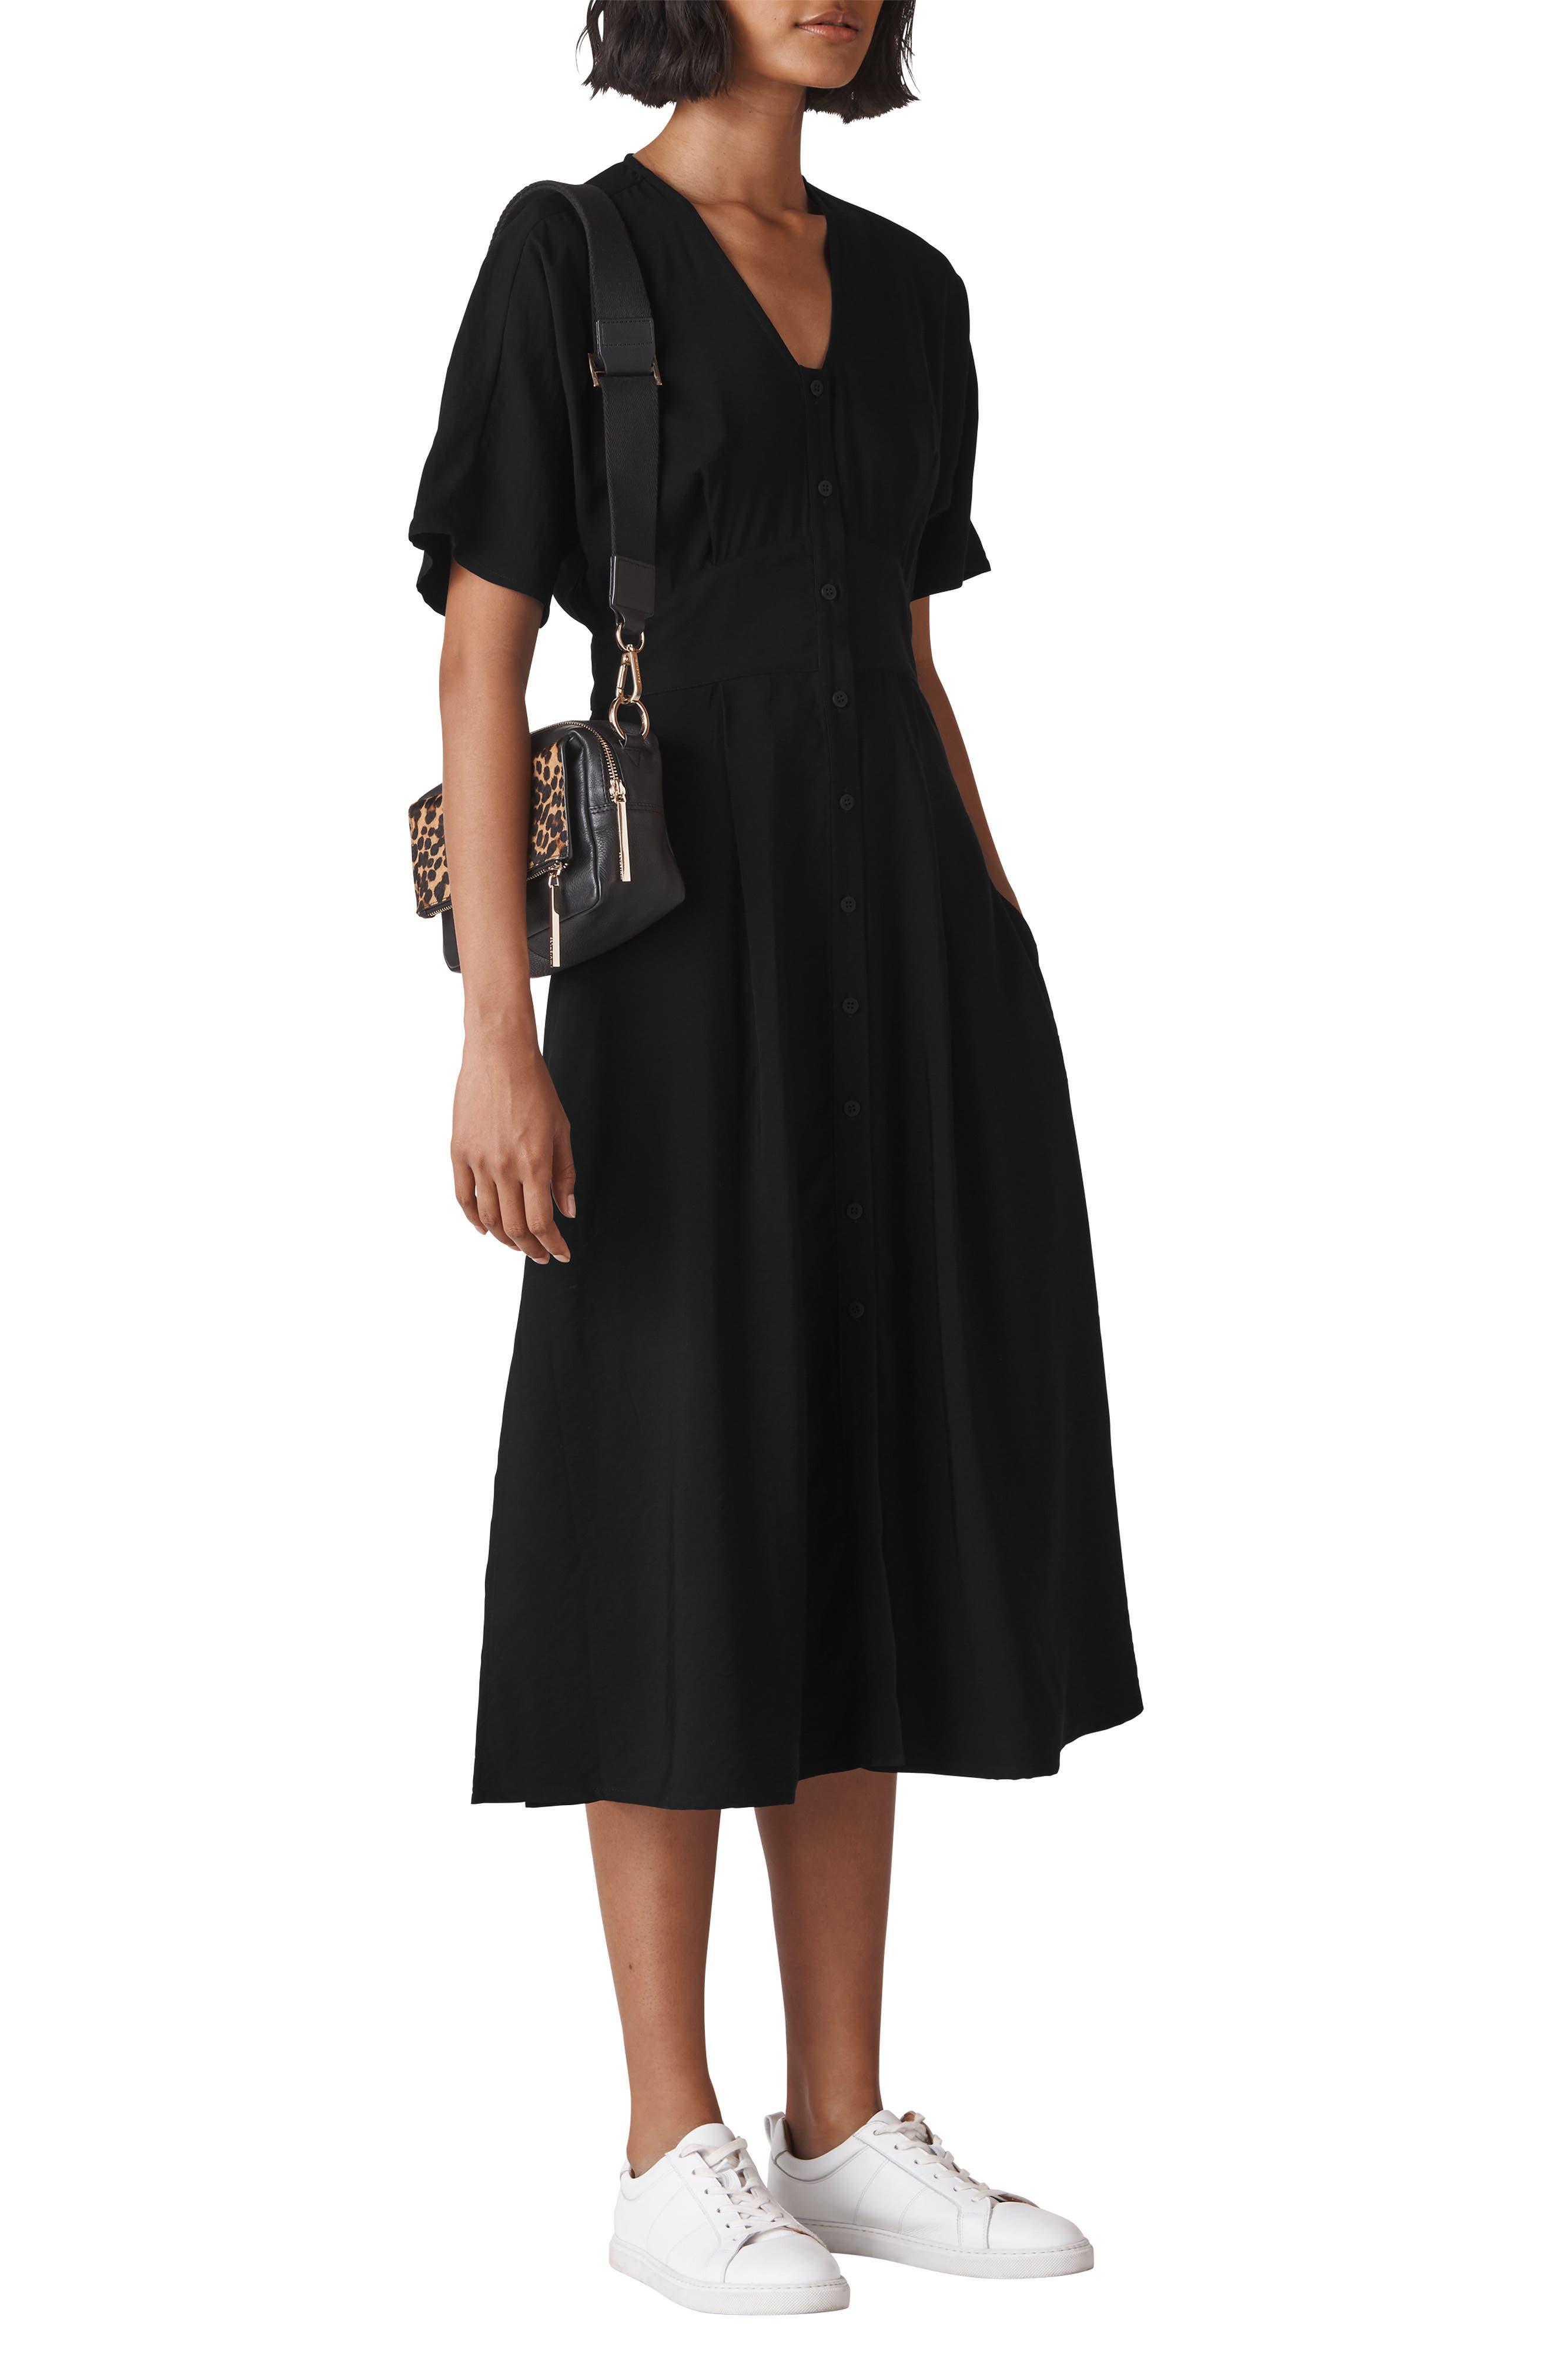 WHISTLES Naya Button Dress, Main, color, 001